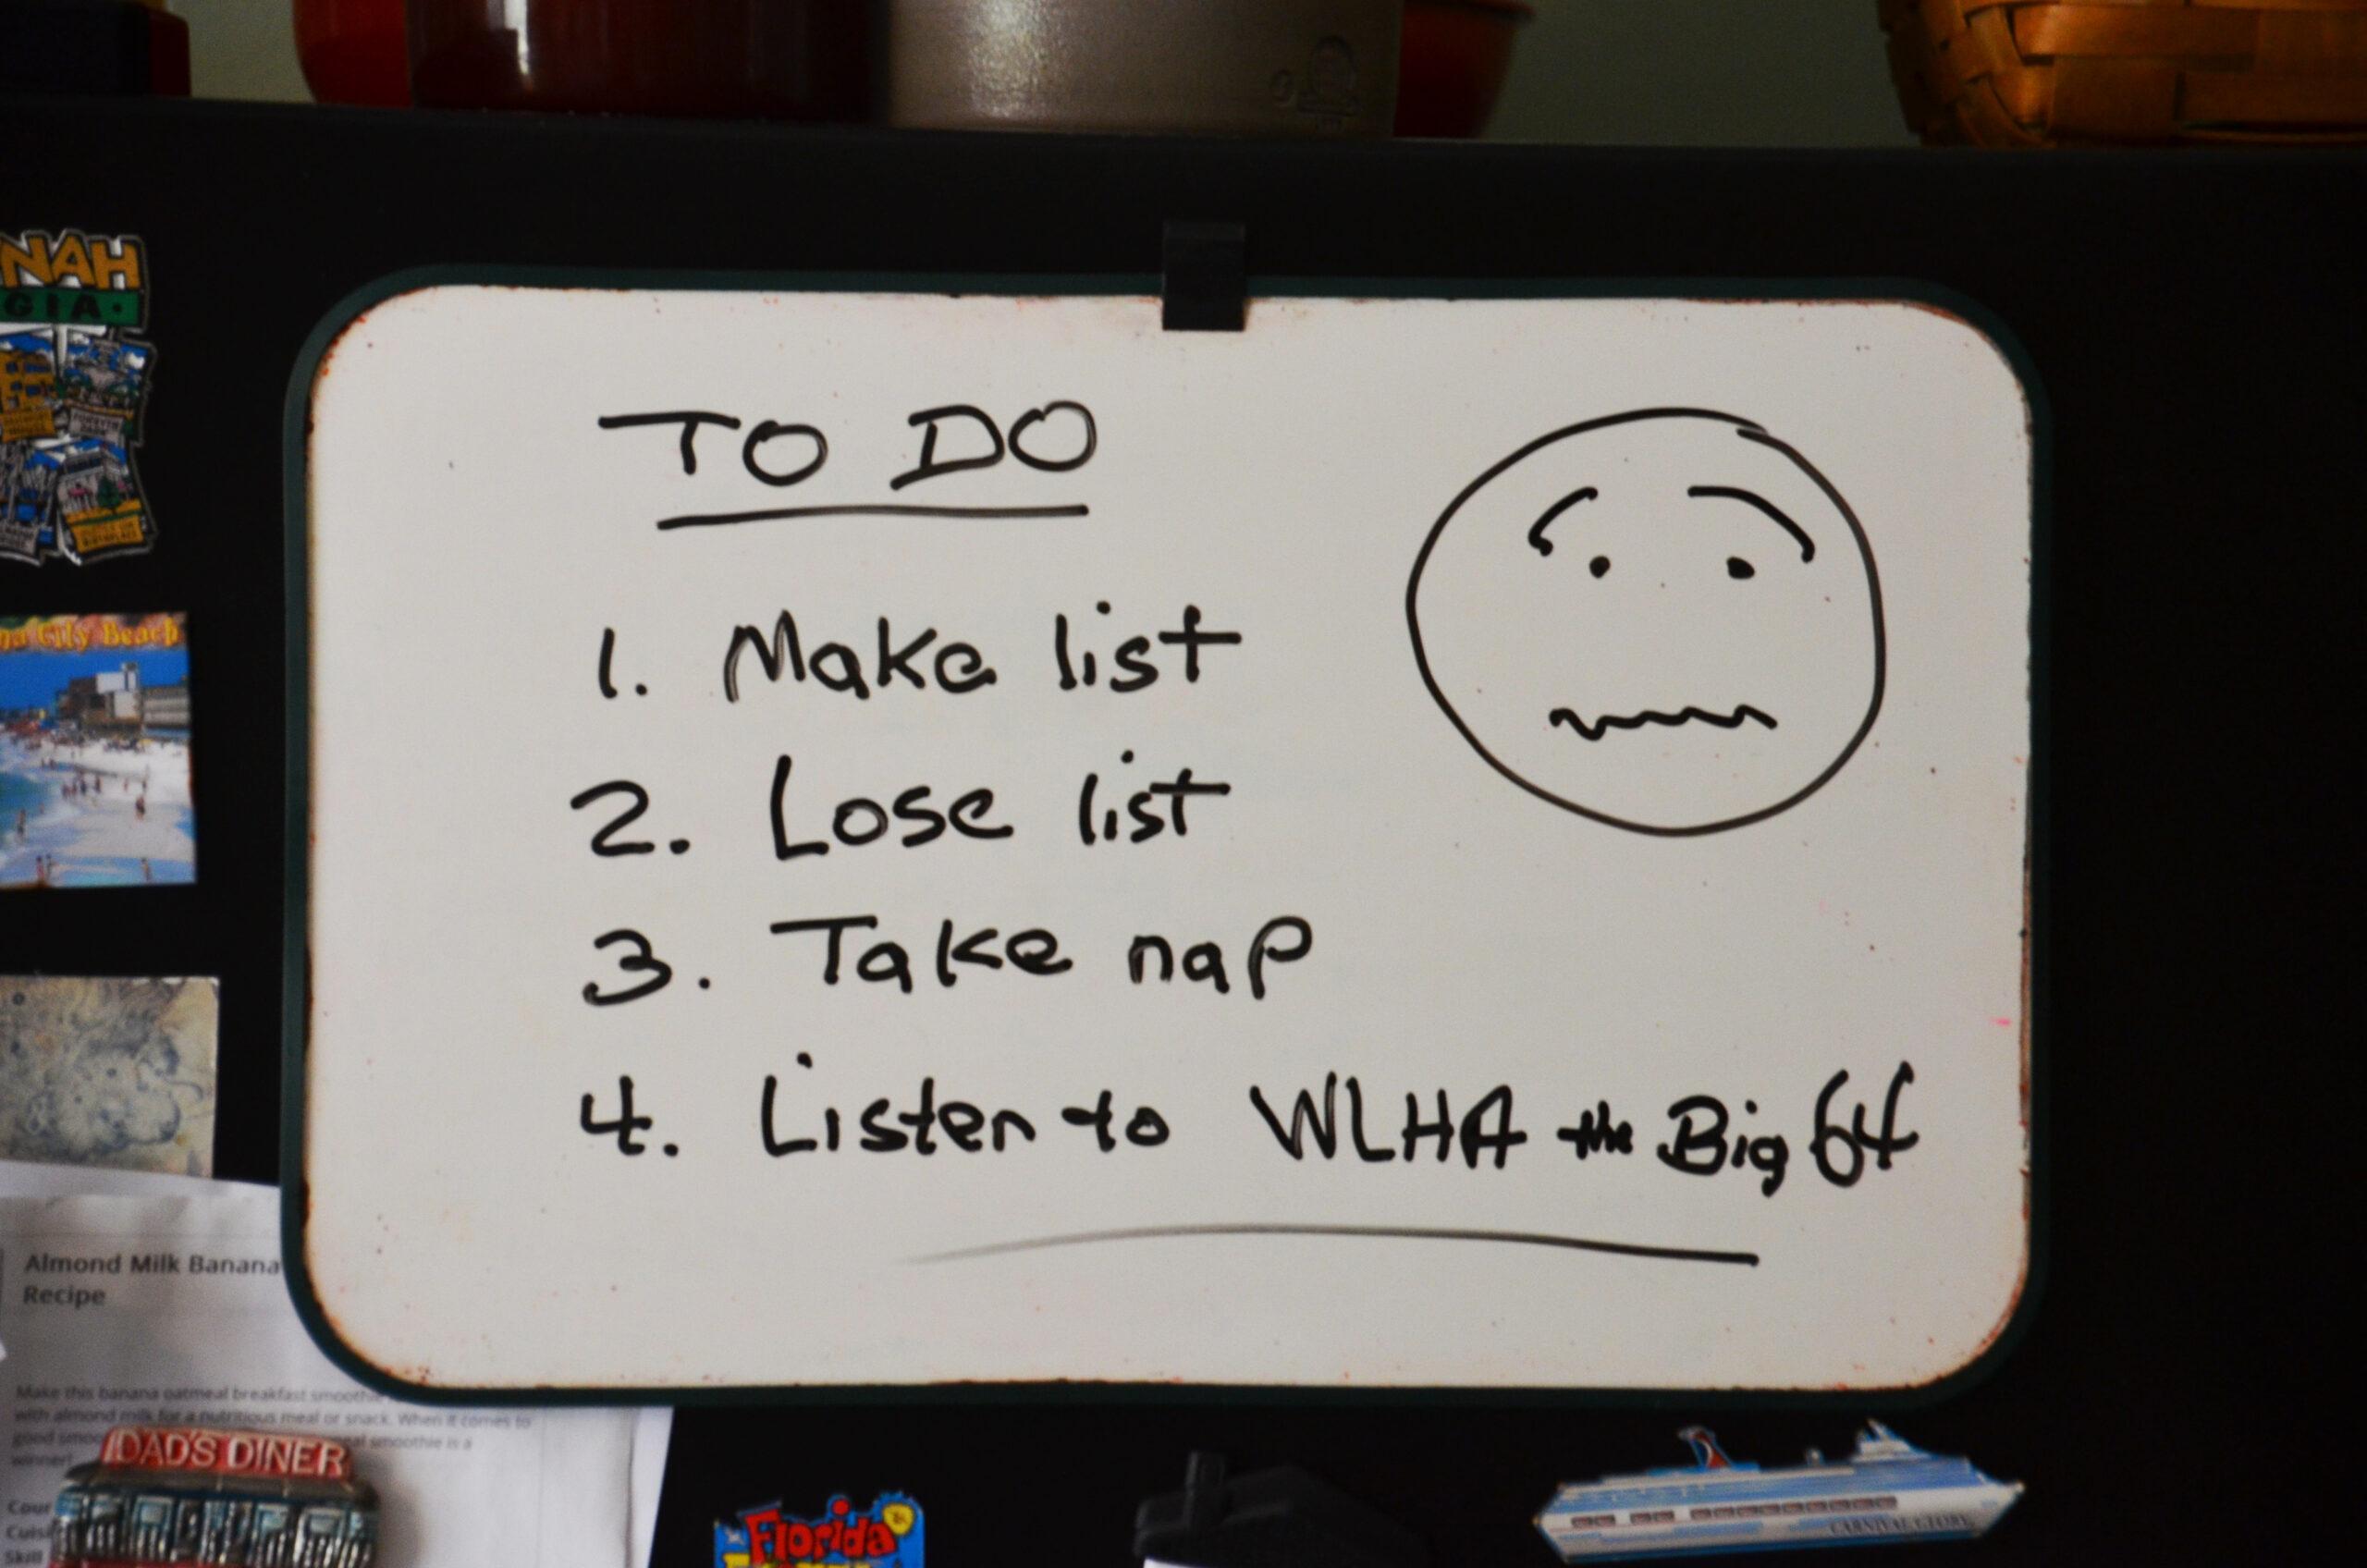 List on a white board